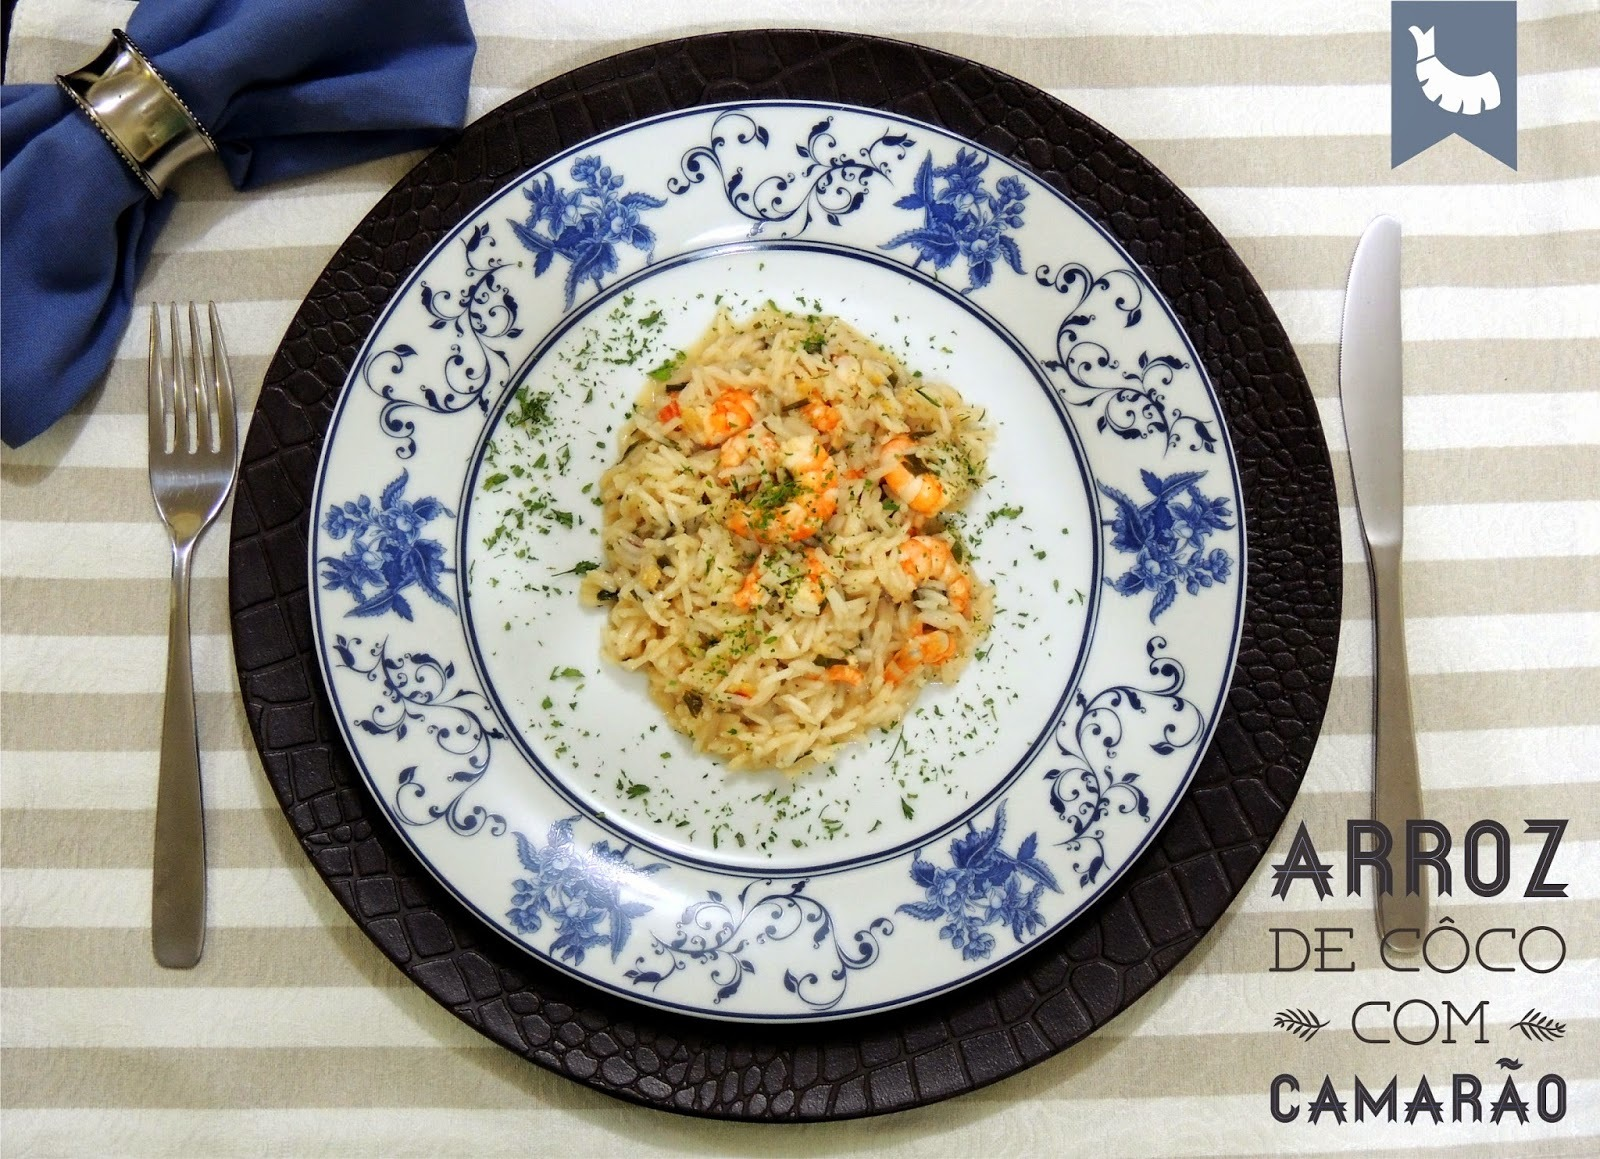 tudo gostoso arroz marinado